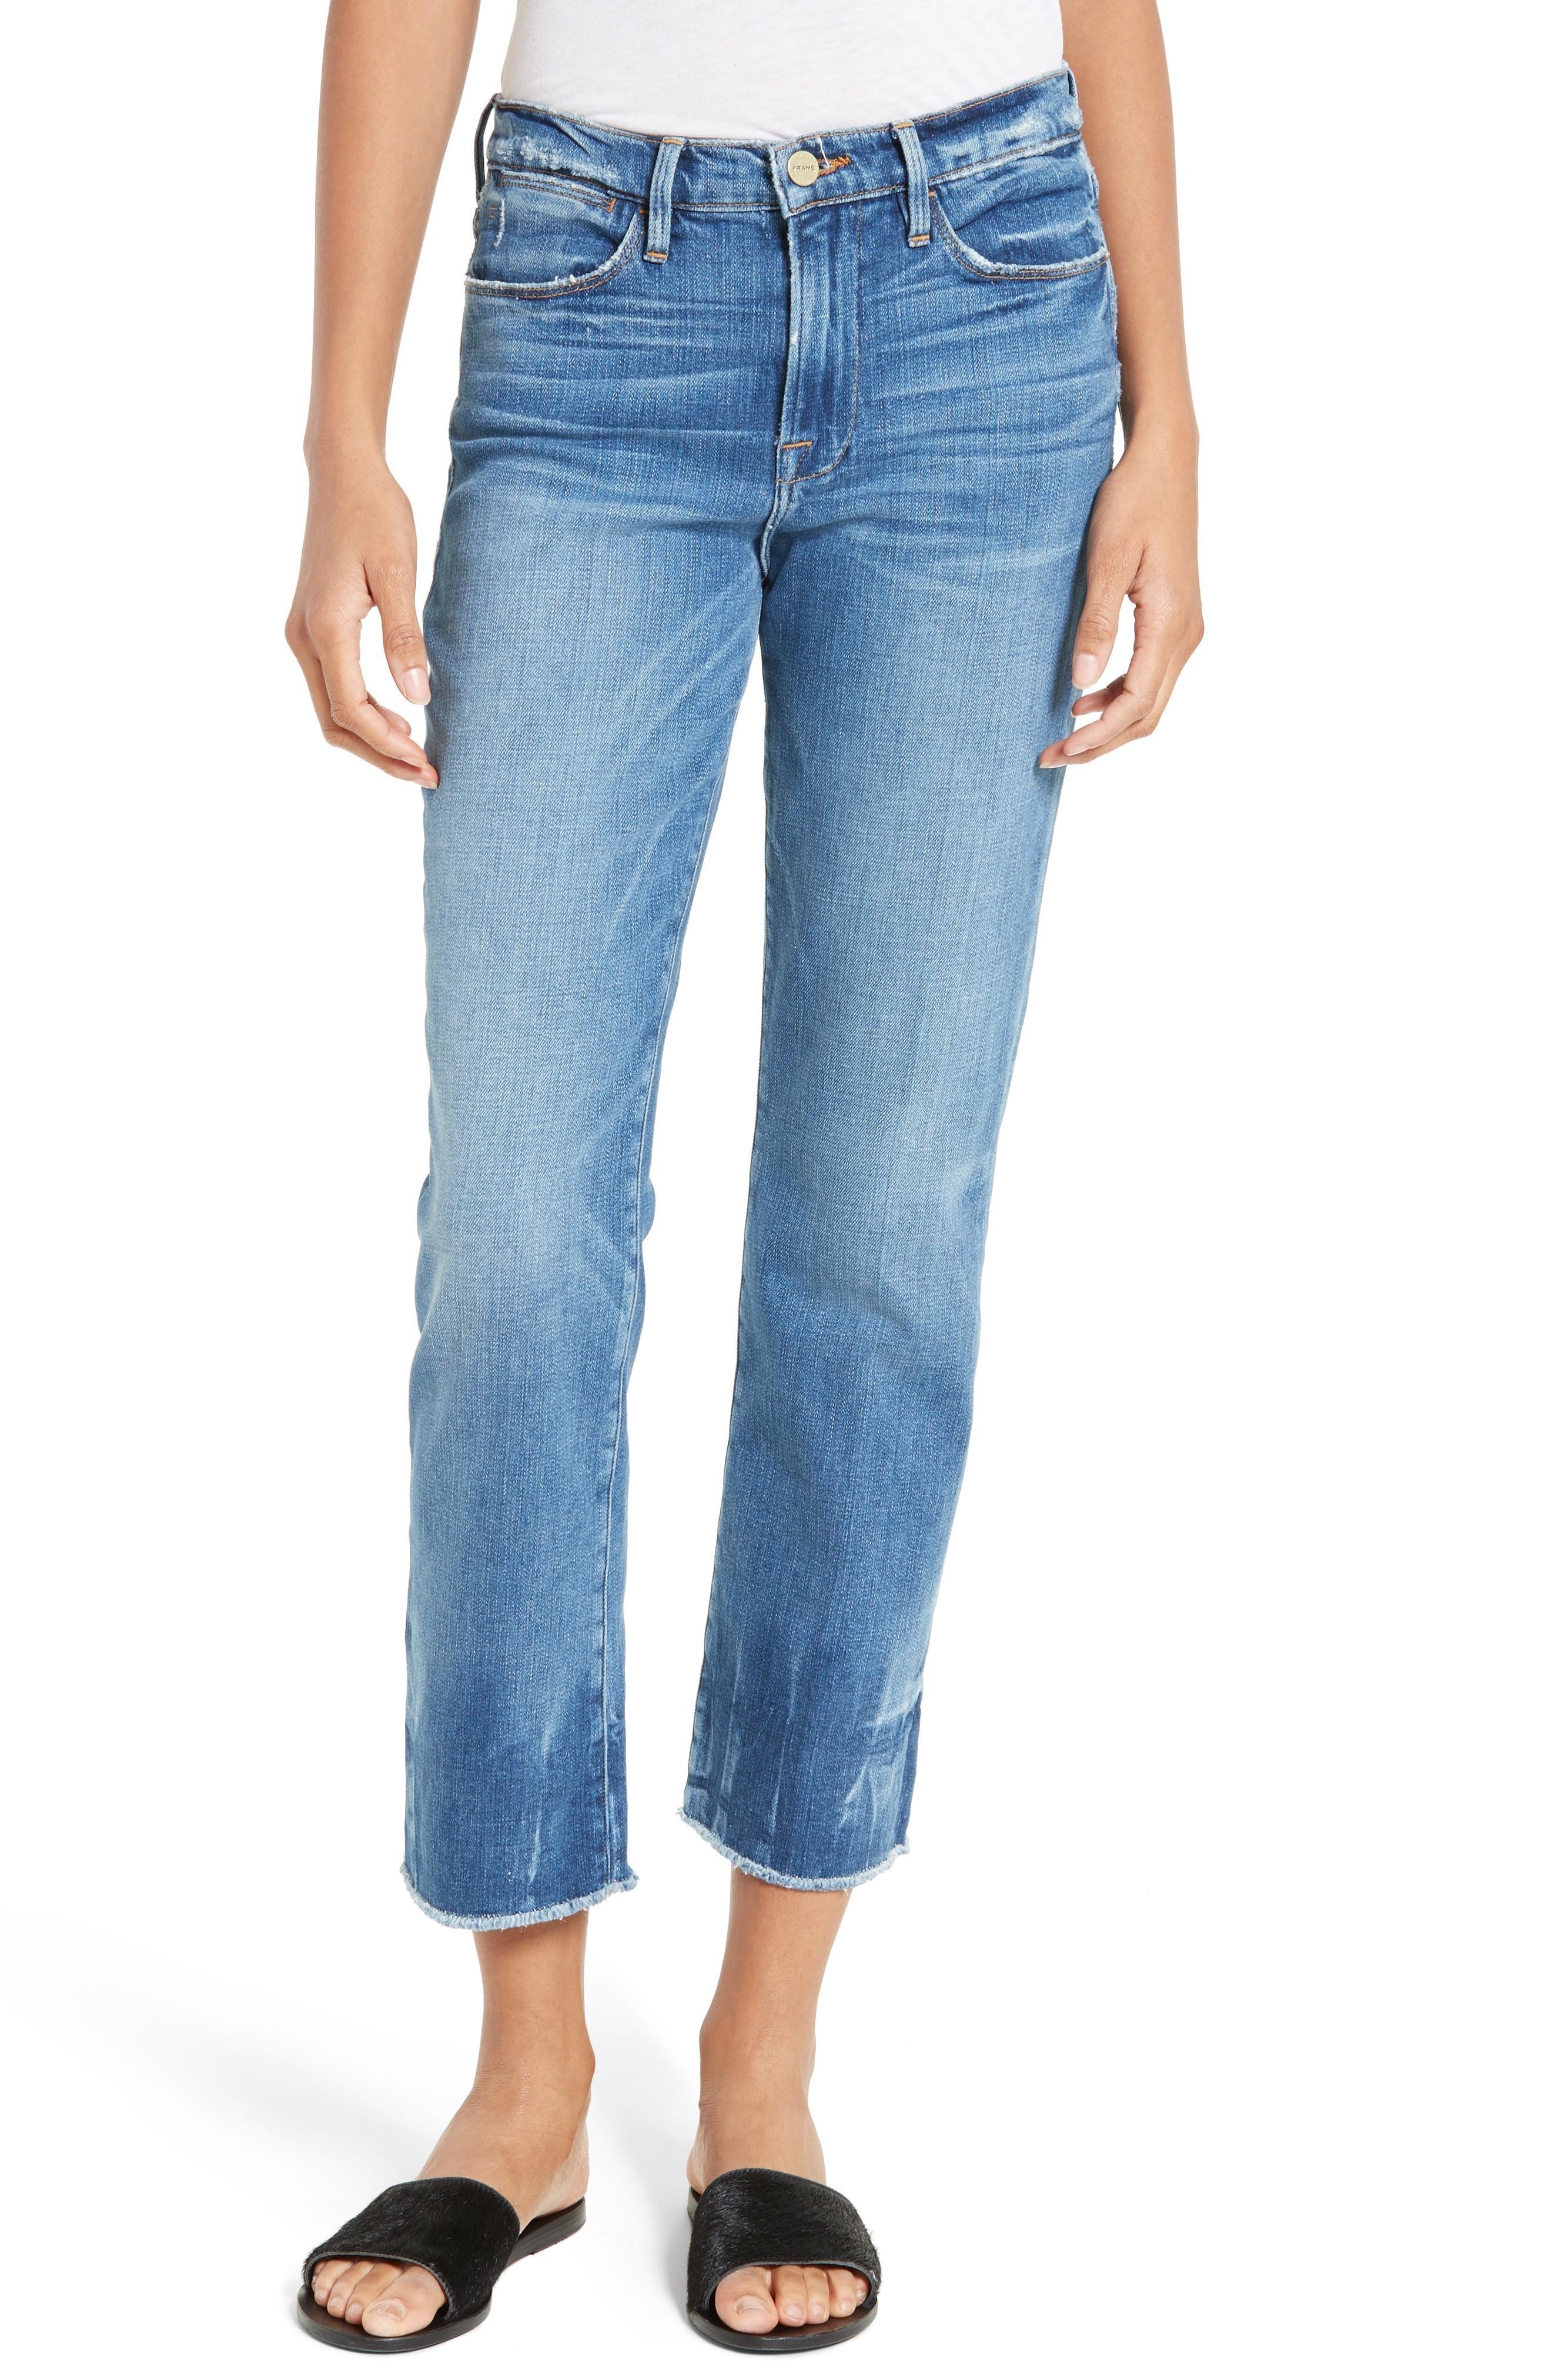 Stunning Frame Denim Le Garcon Inspiration | Amusing Mid Rise Boyfriend Jeans